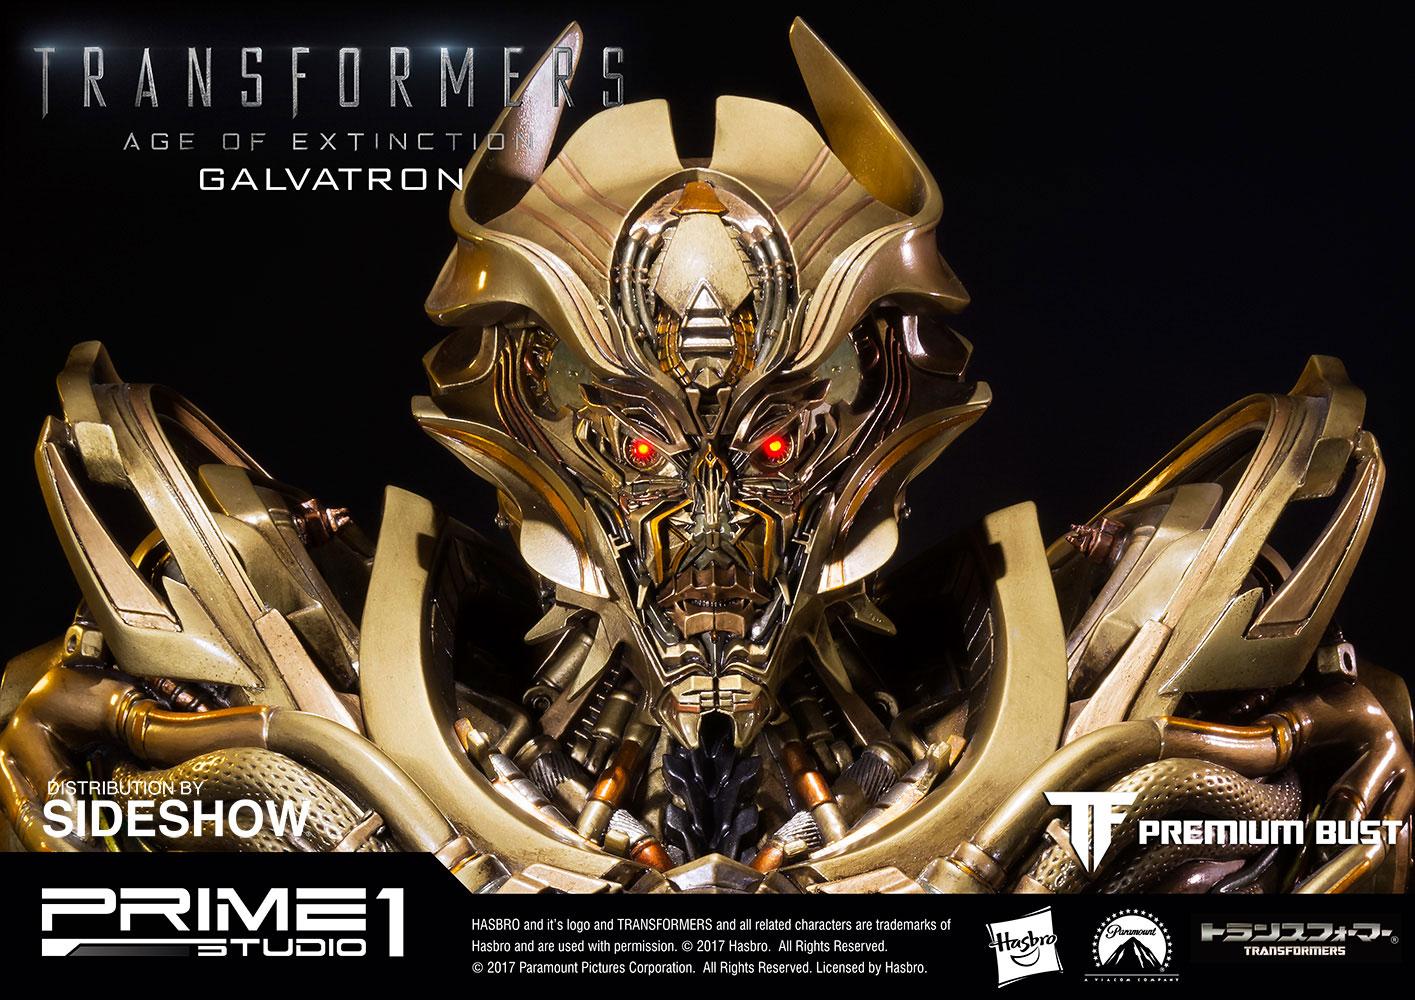 transformers-galvatron-gold-bust-prime-1-studio-1